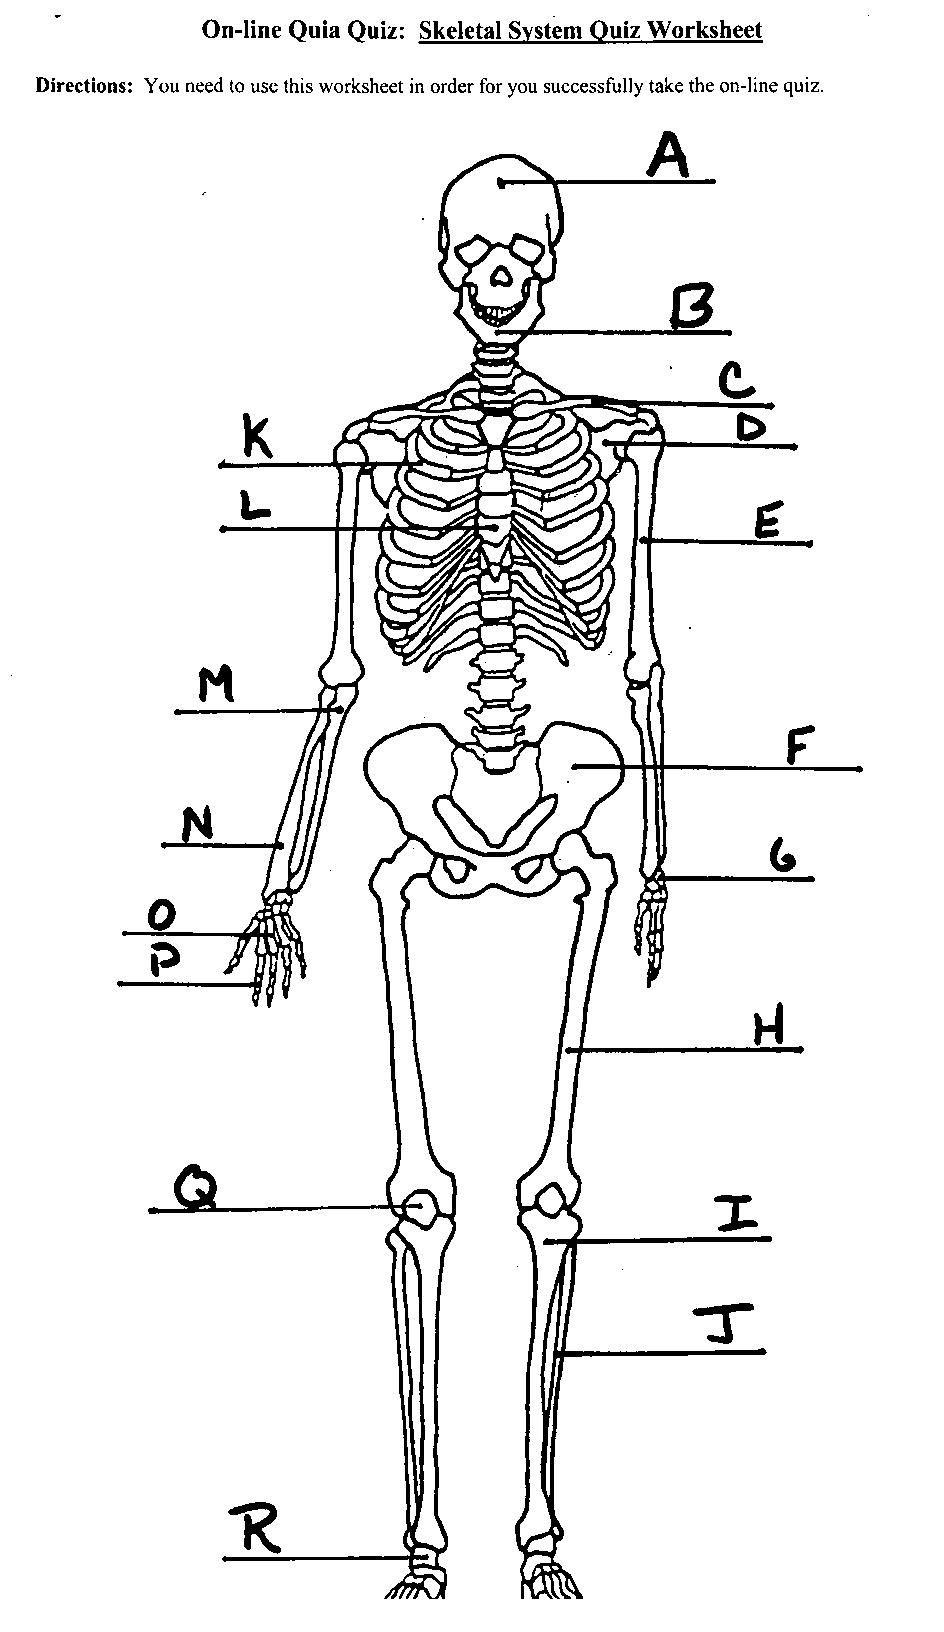 unlabeled diagram of the human skeleton unlabeled diagram of the human skeleton human bone structure [ 944 x 1632 Pixel ]